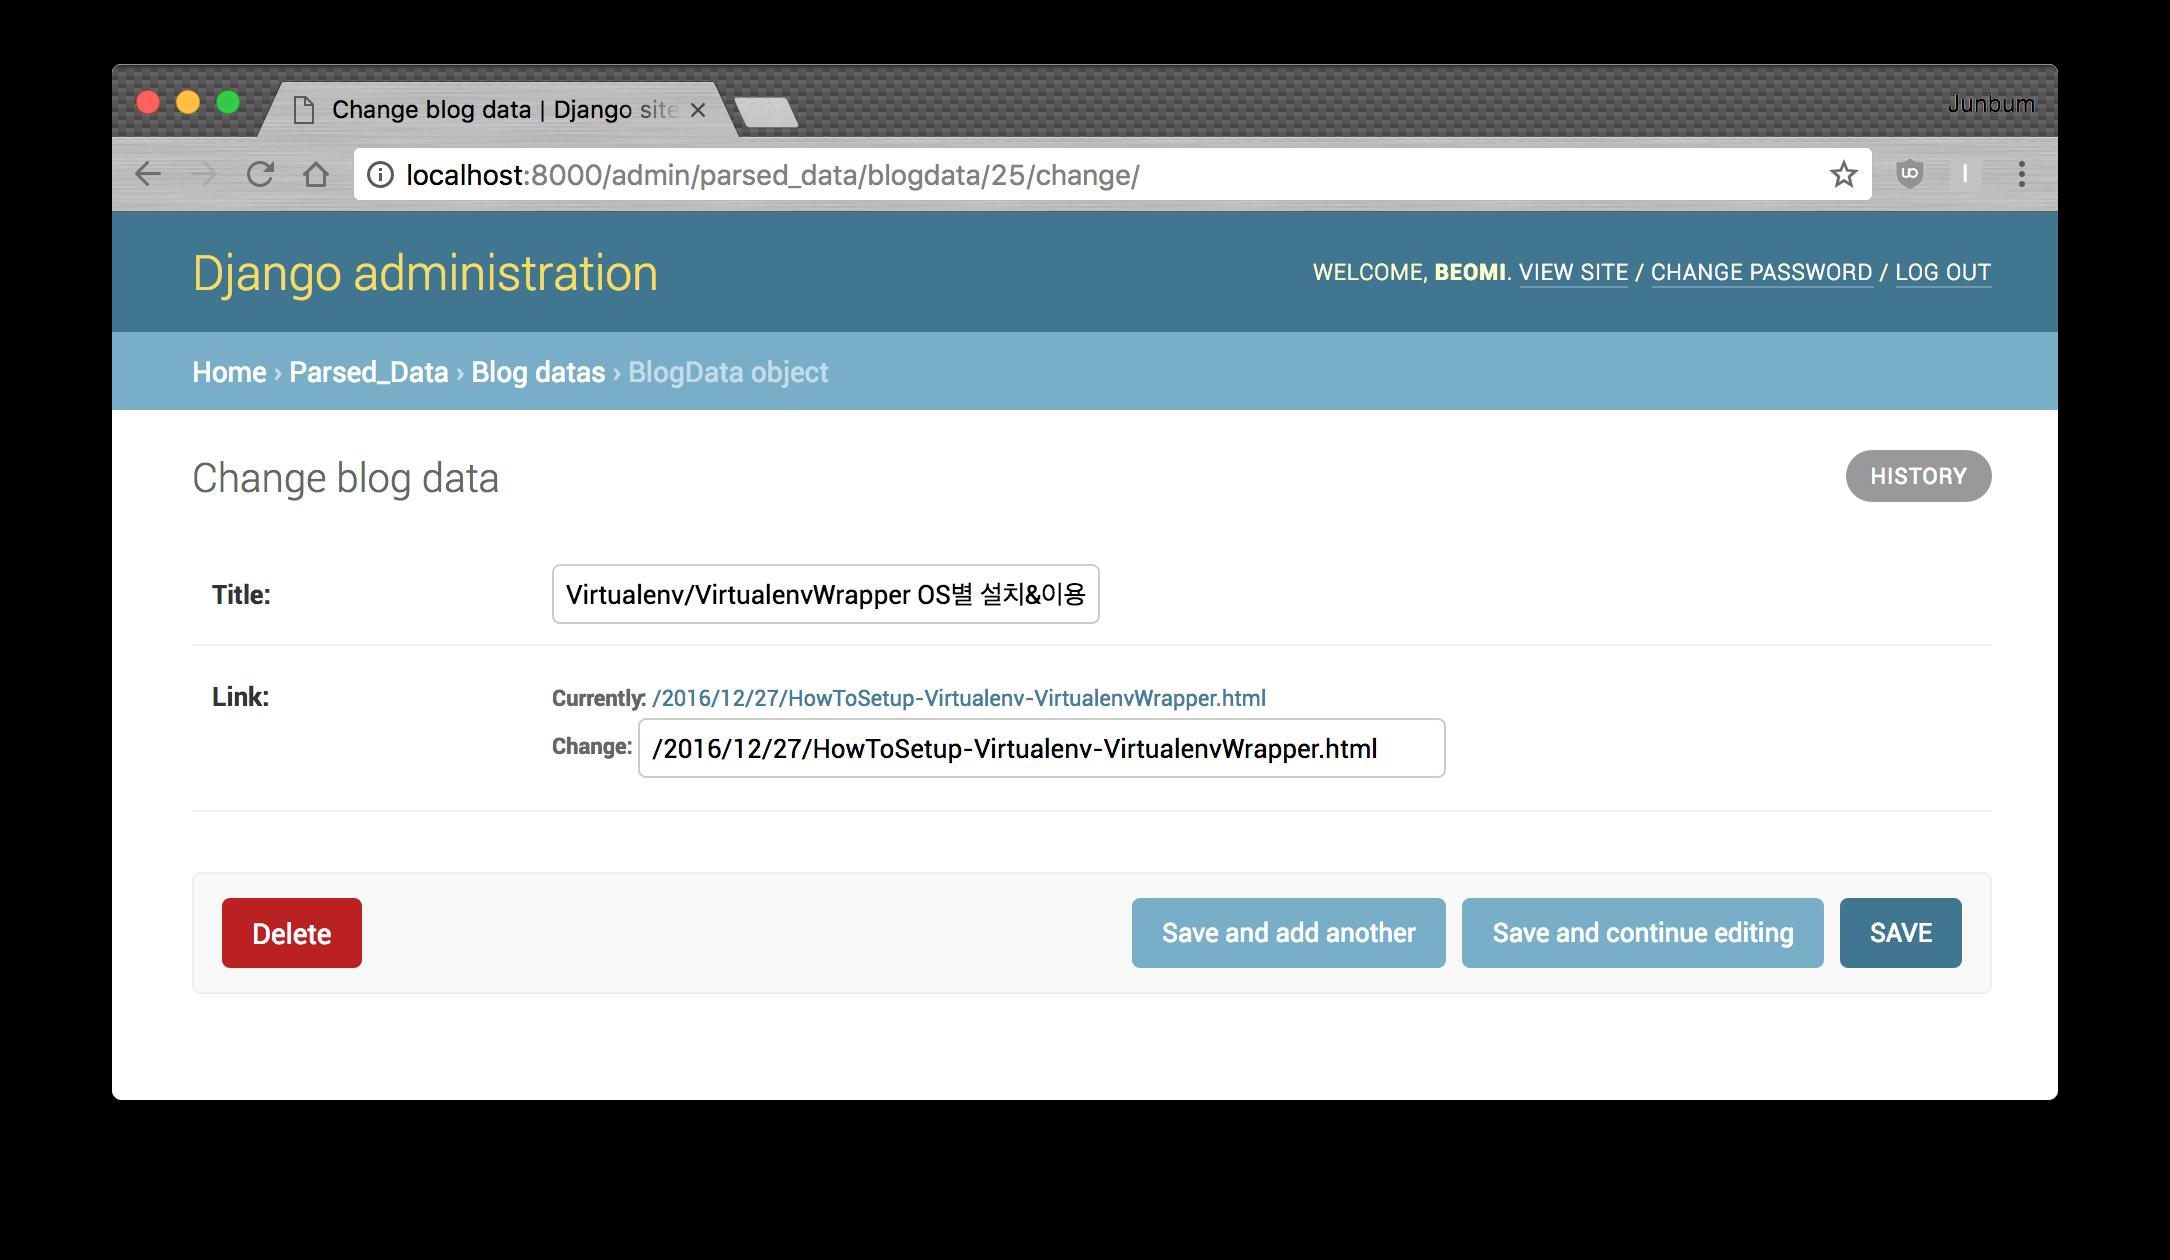 blogdata specific data